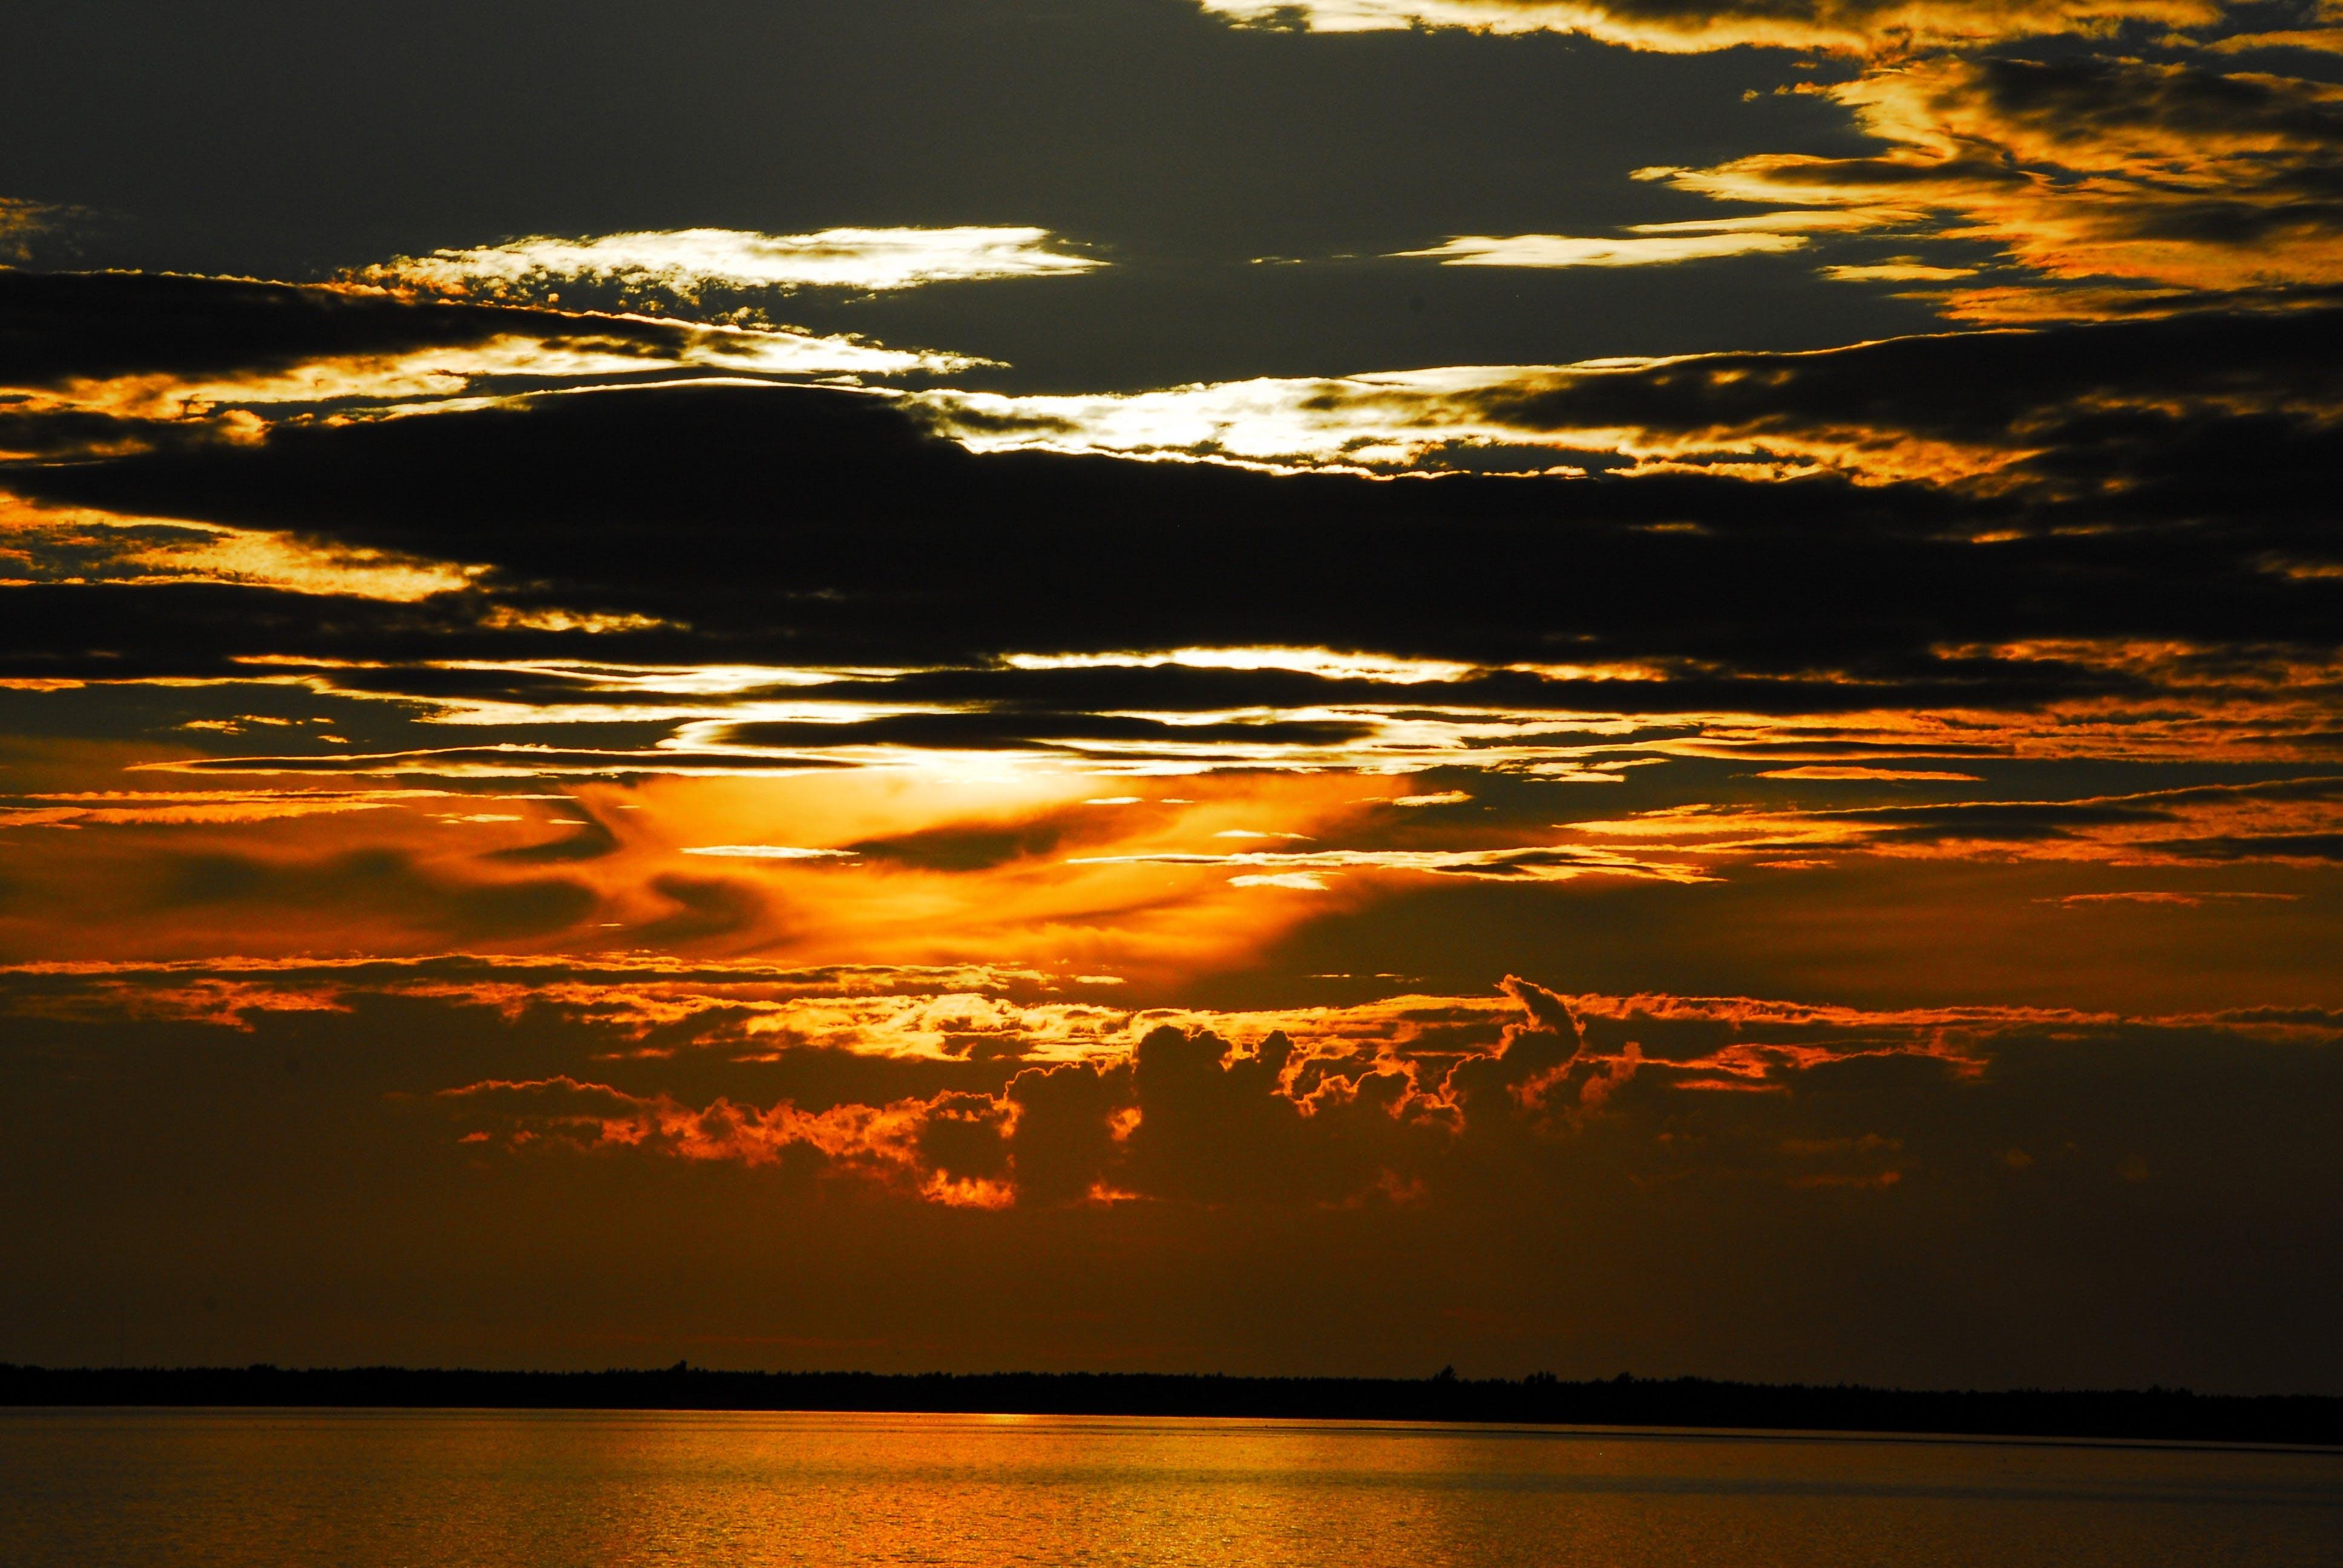 backlit, beach, clouds